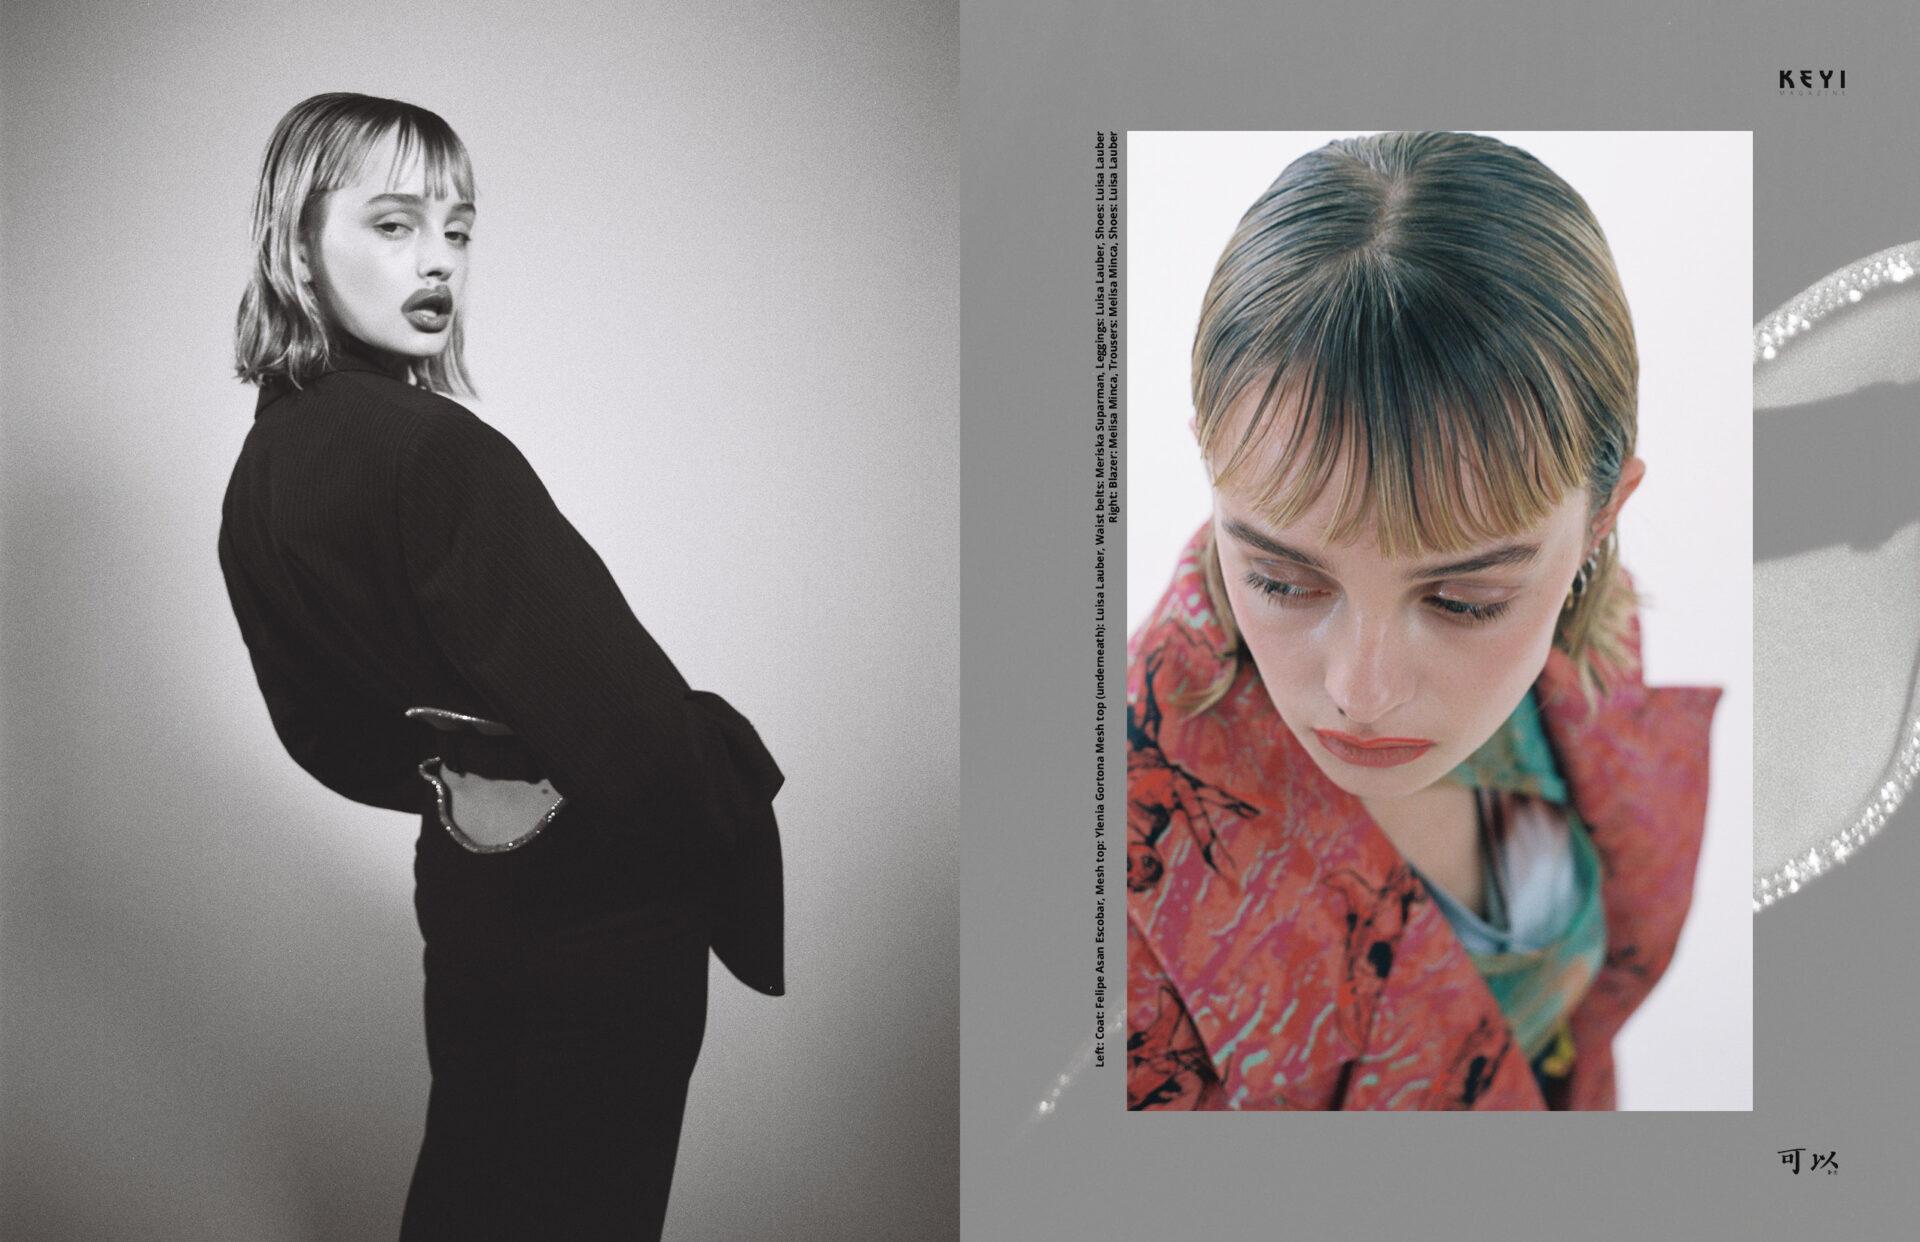 """Time Distortion"" by Grzegorz Bacinski & Izabella Chrobok with Maja Bons from Izaio Model Management. Styling by Samantha Pletzke and Make up & Hair by Claudia Fischer"